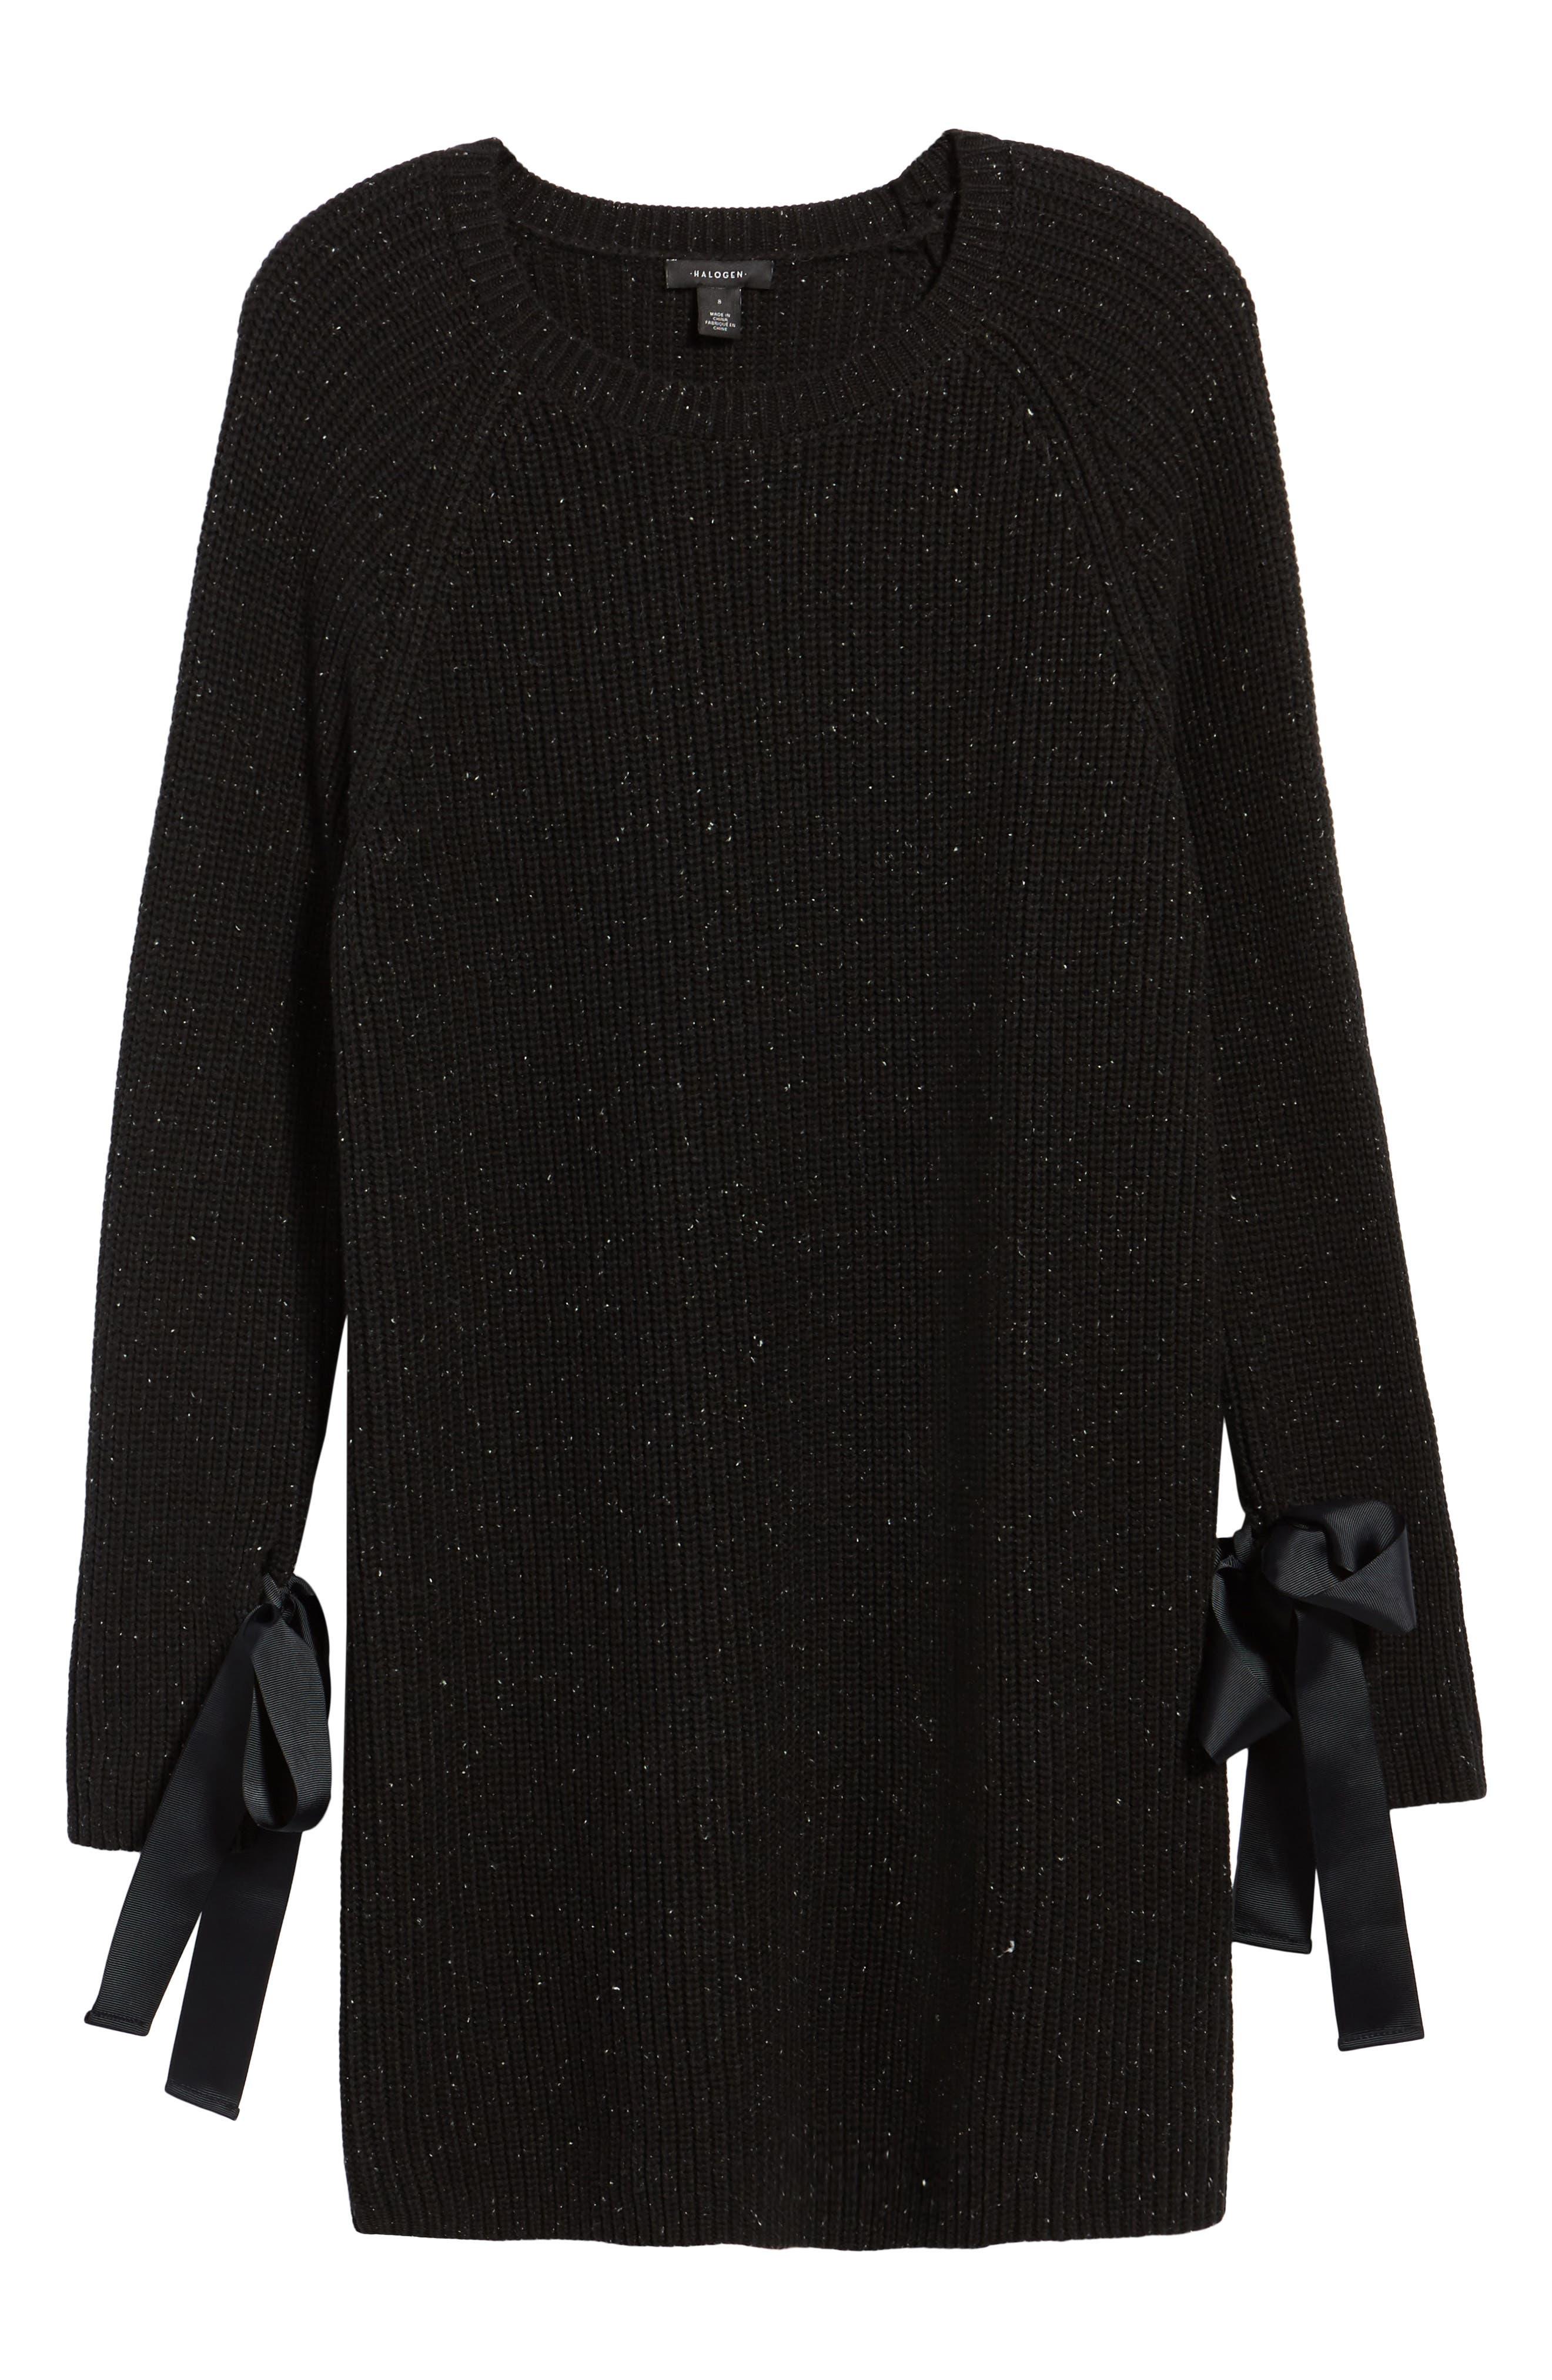 Bow Sleeve Tunic,                             Alternate thumbnail 6, color,                             Black Nep Pattern